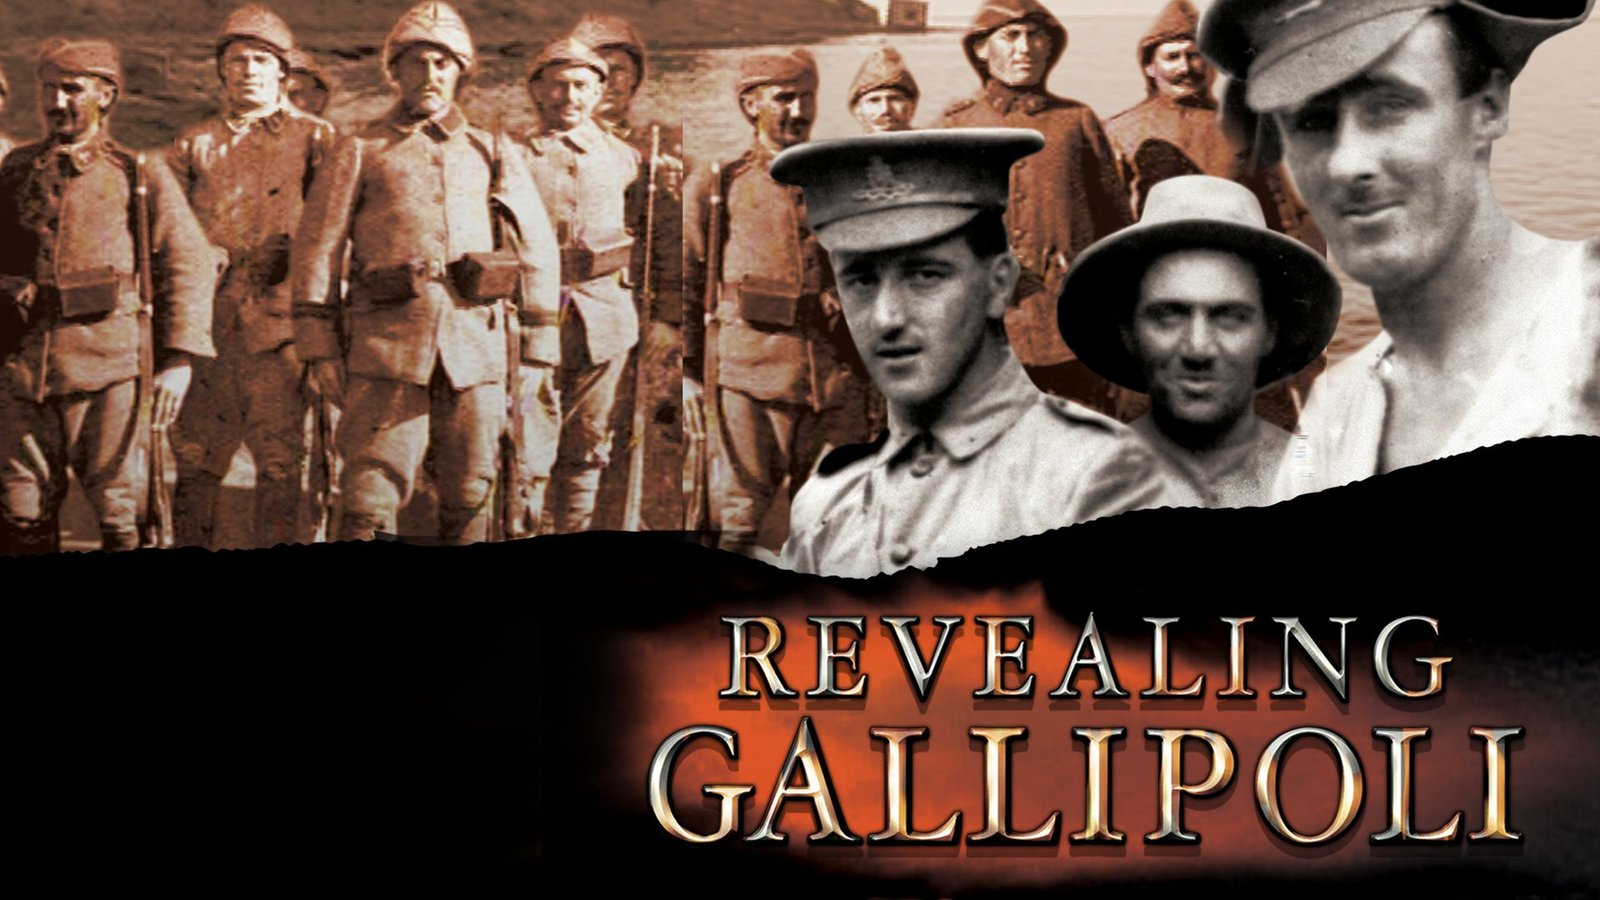 Revealing Gallipoli